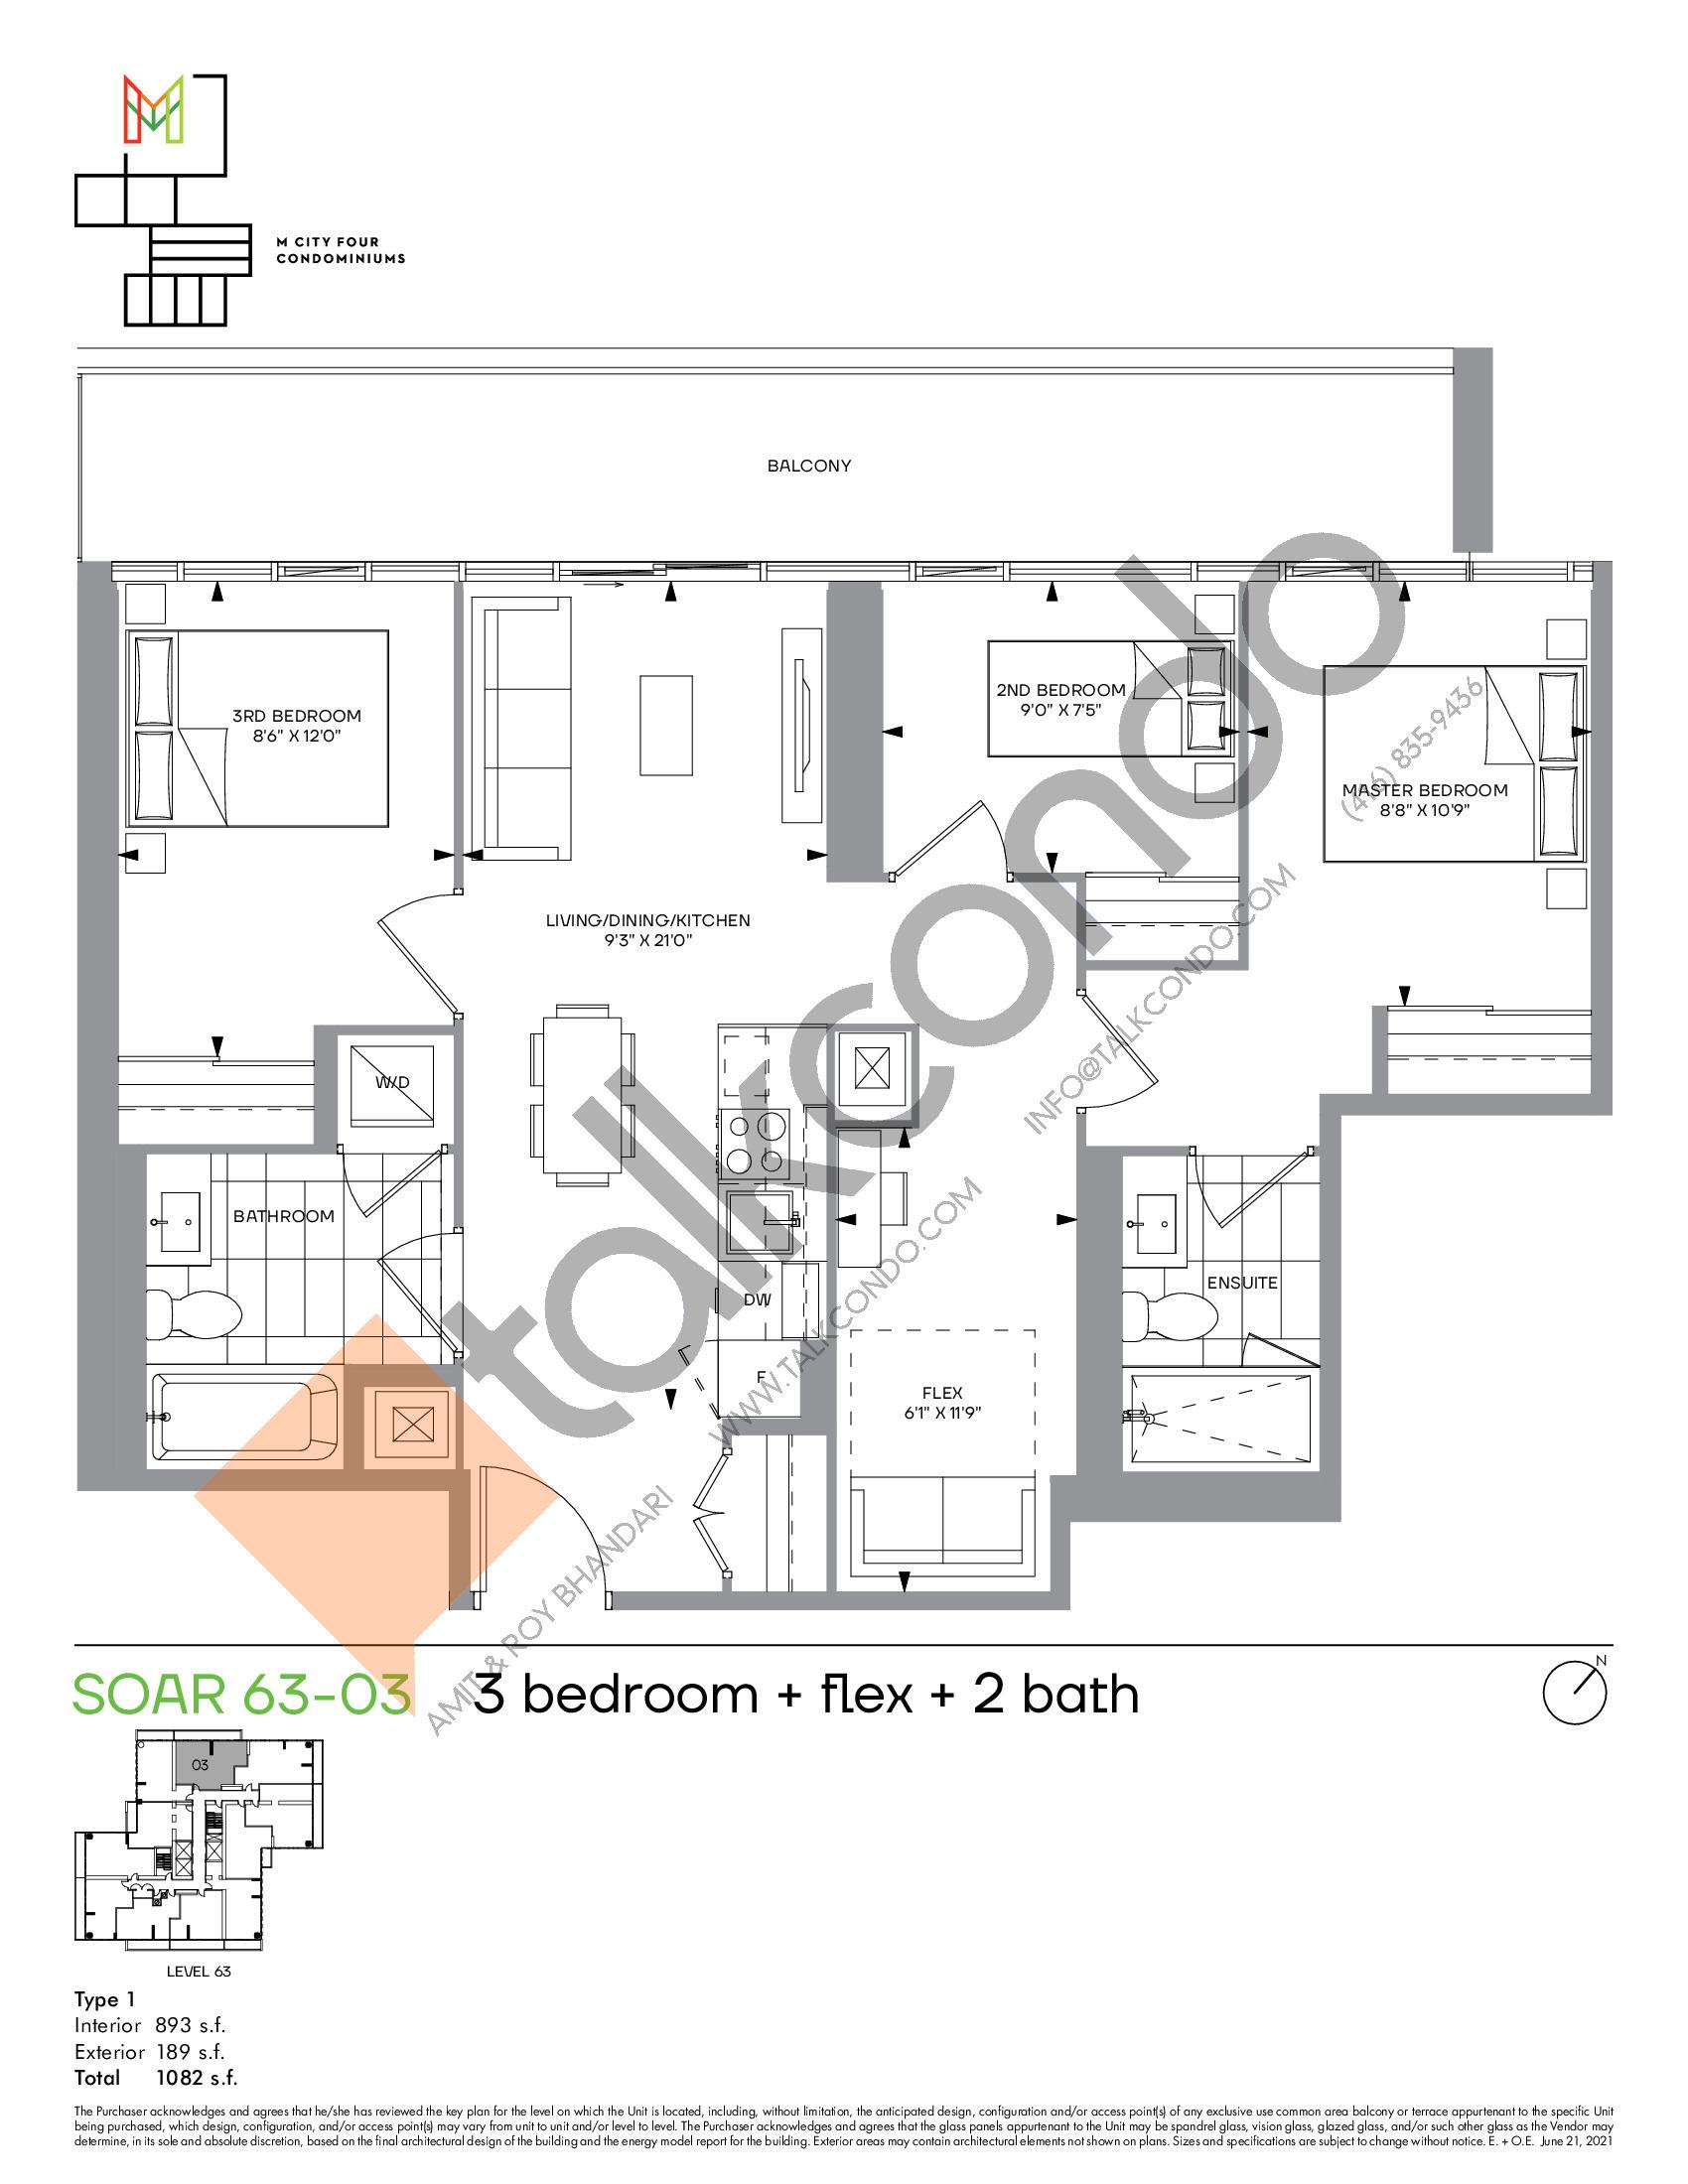 Soar 63-03 Floor Plan at M4 Condos - 893 sq.ft